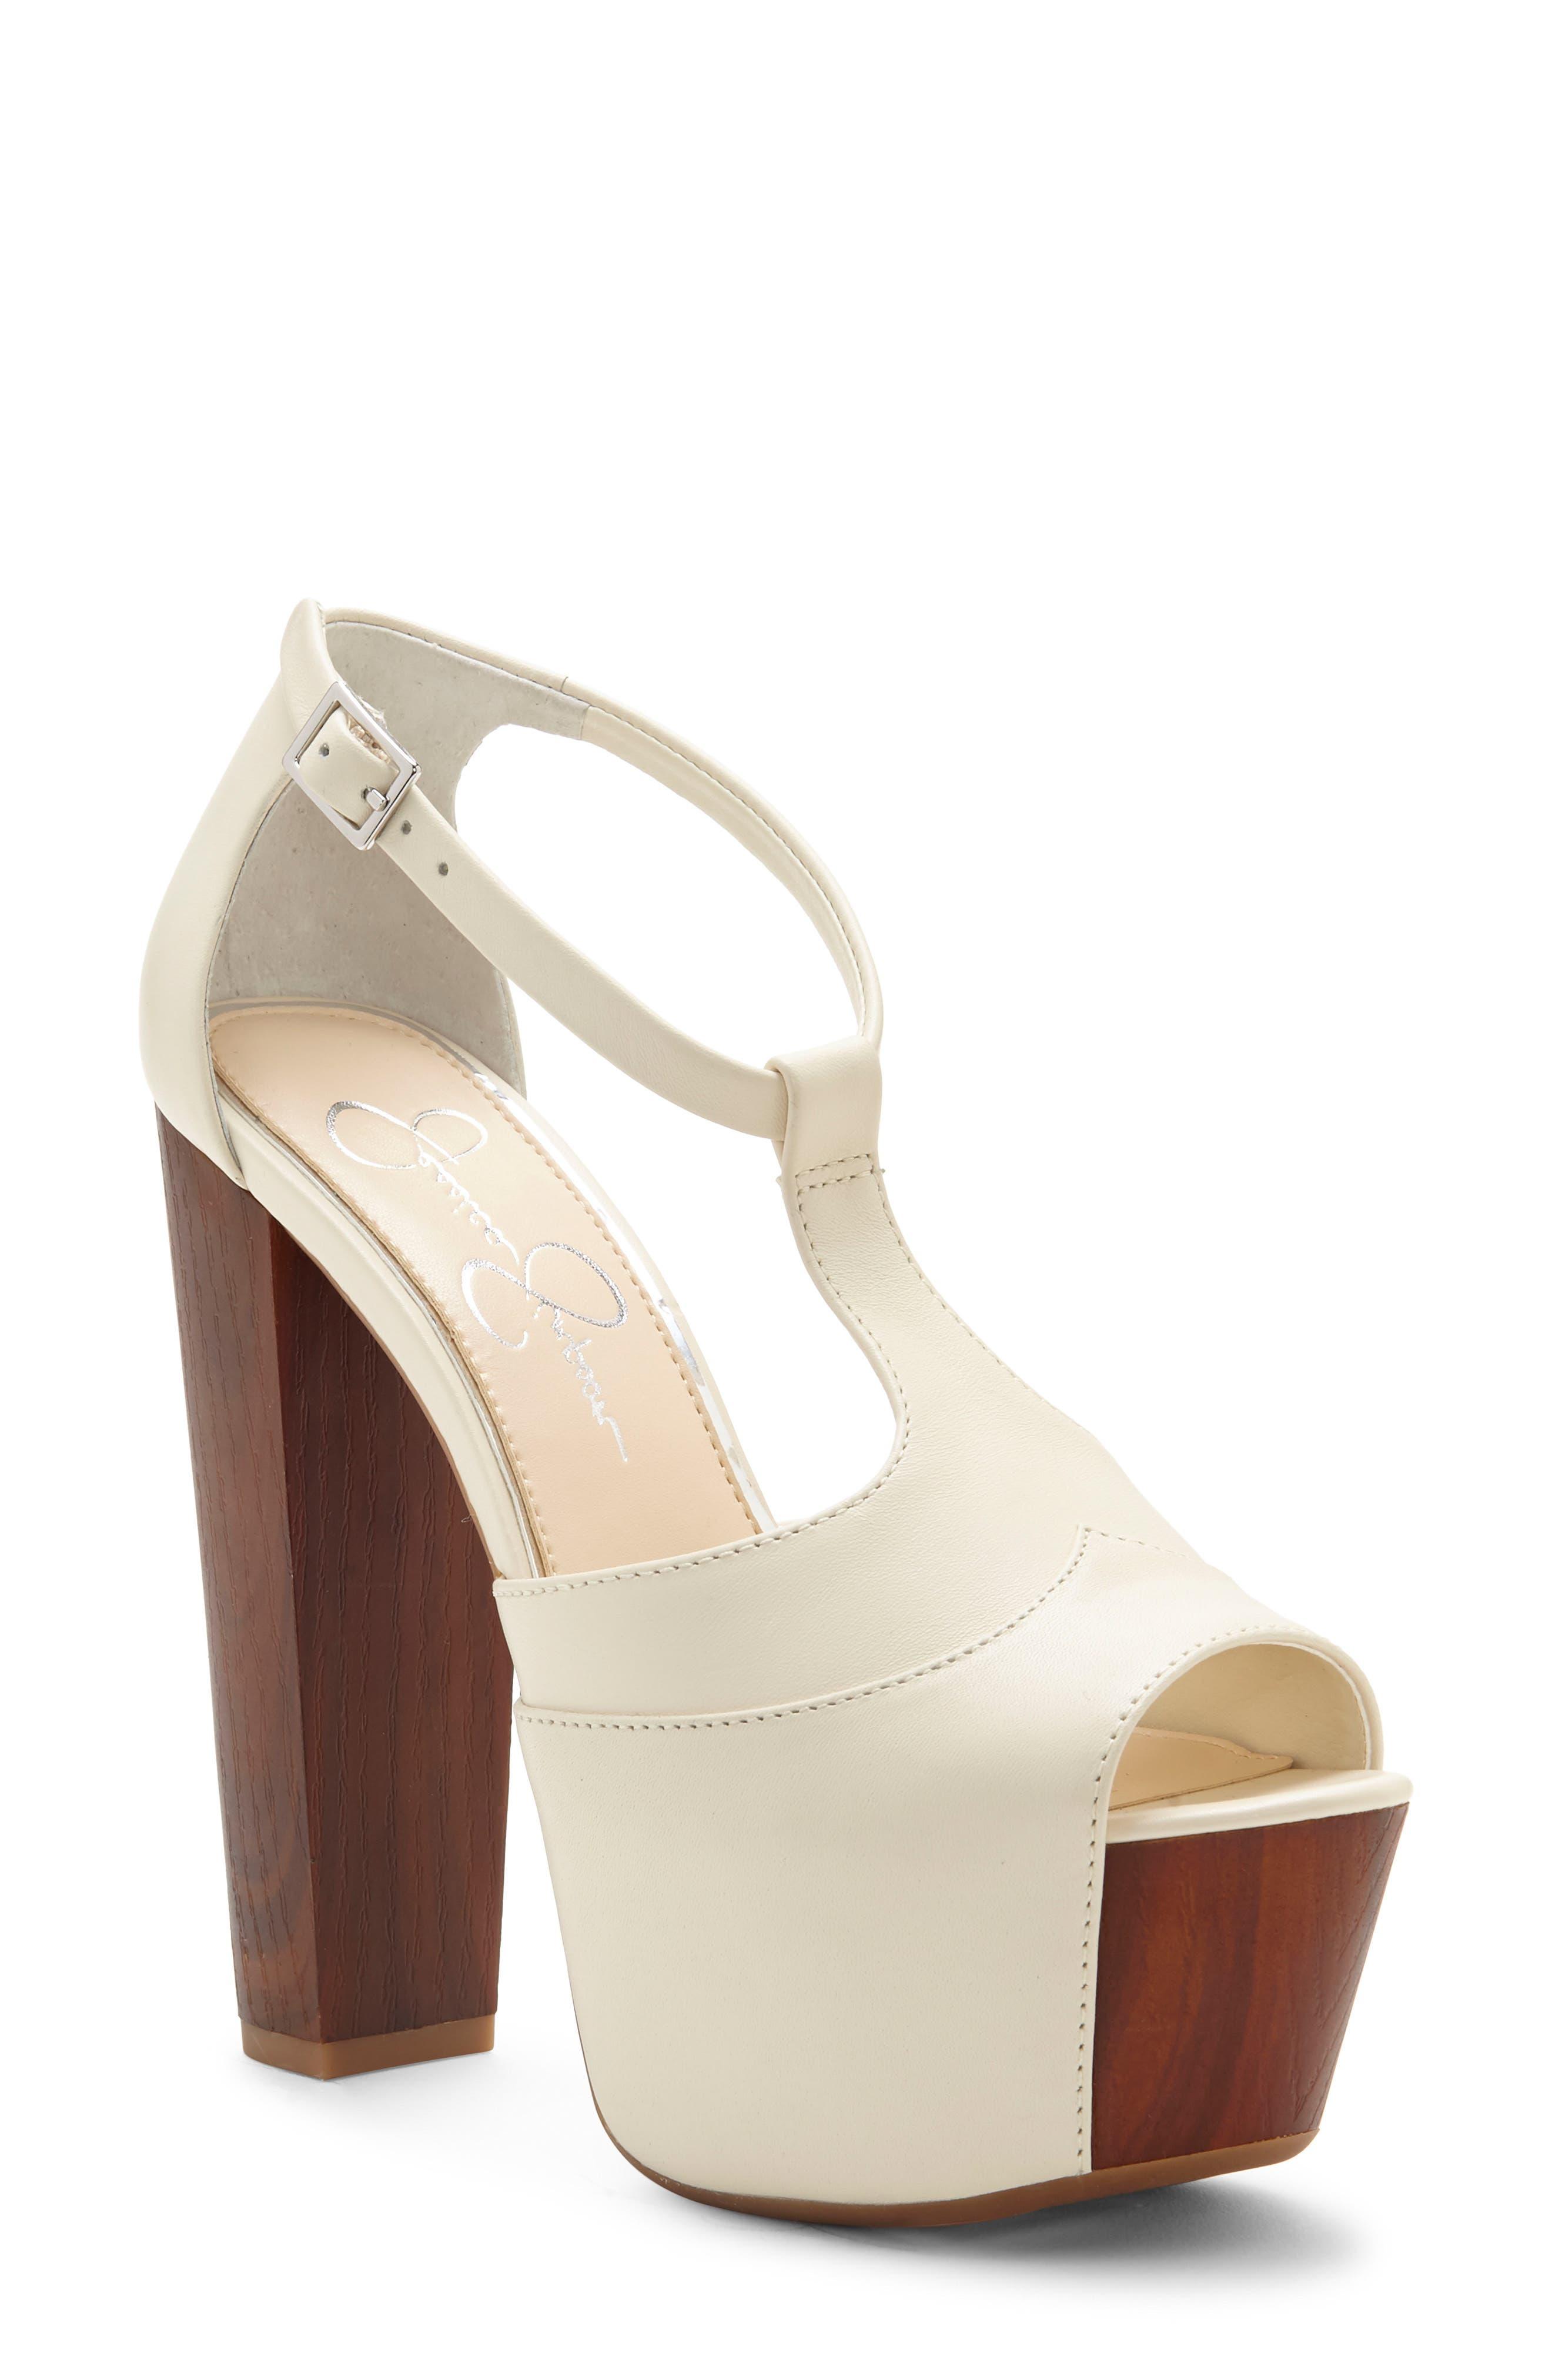 67e9422bae Jessica Simpson 'Dany' Sandal, Ivory